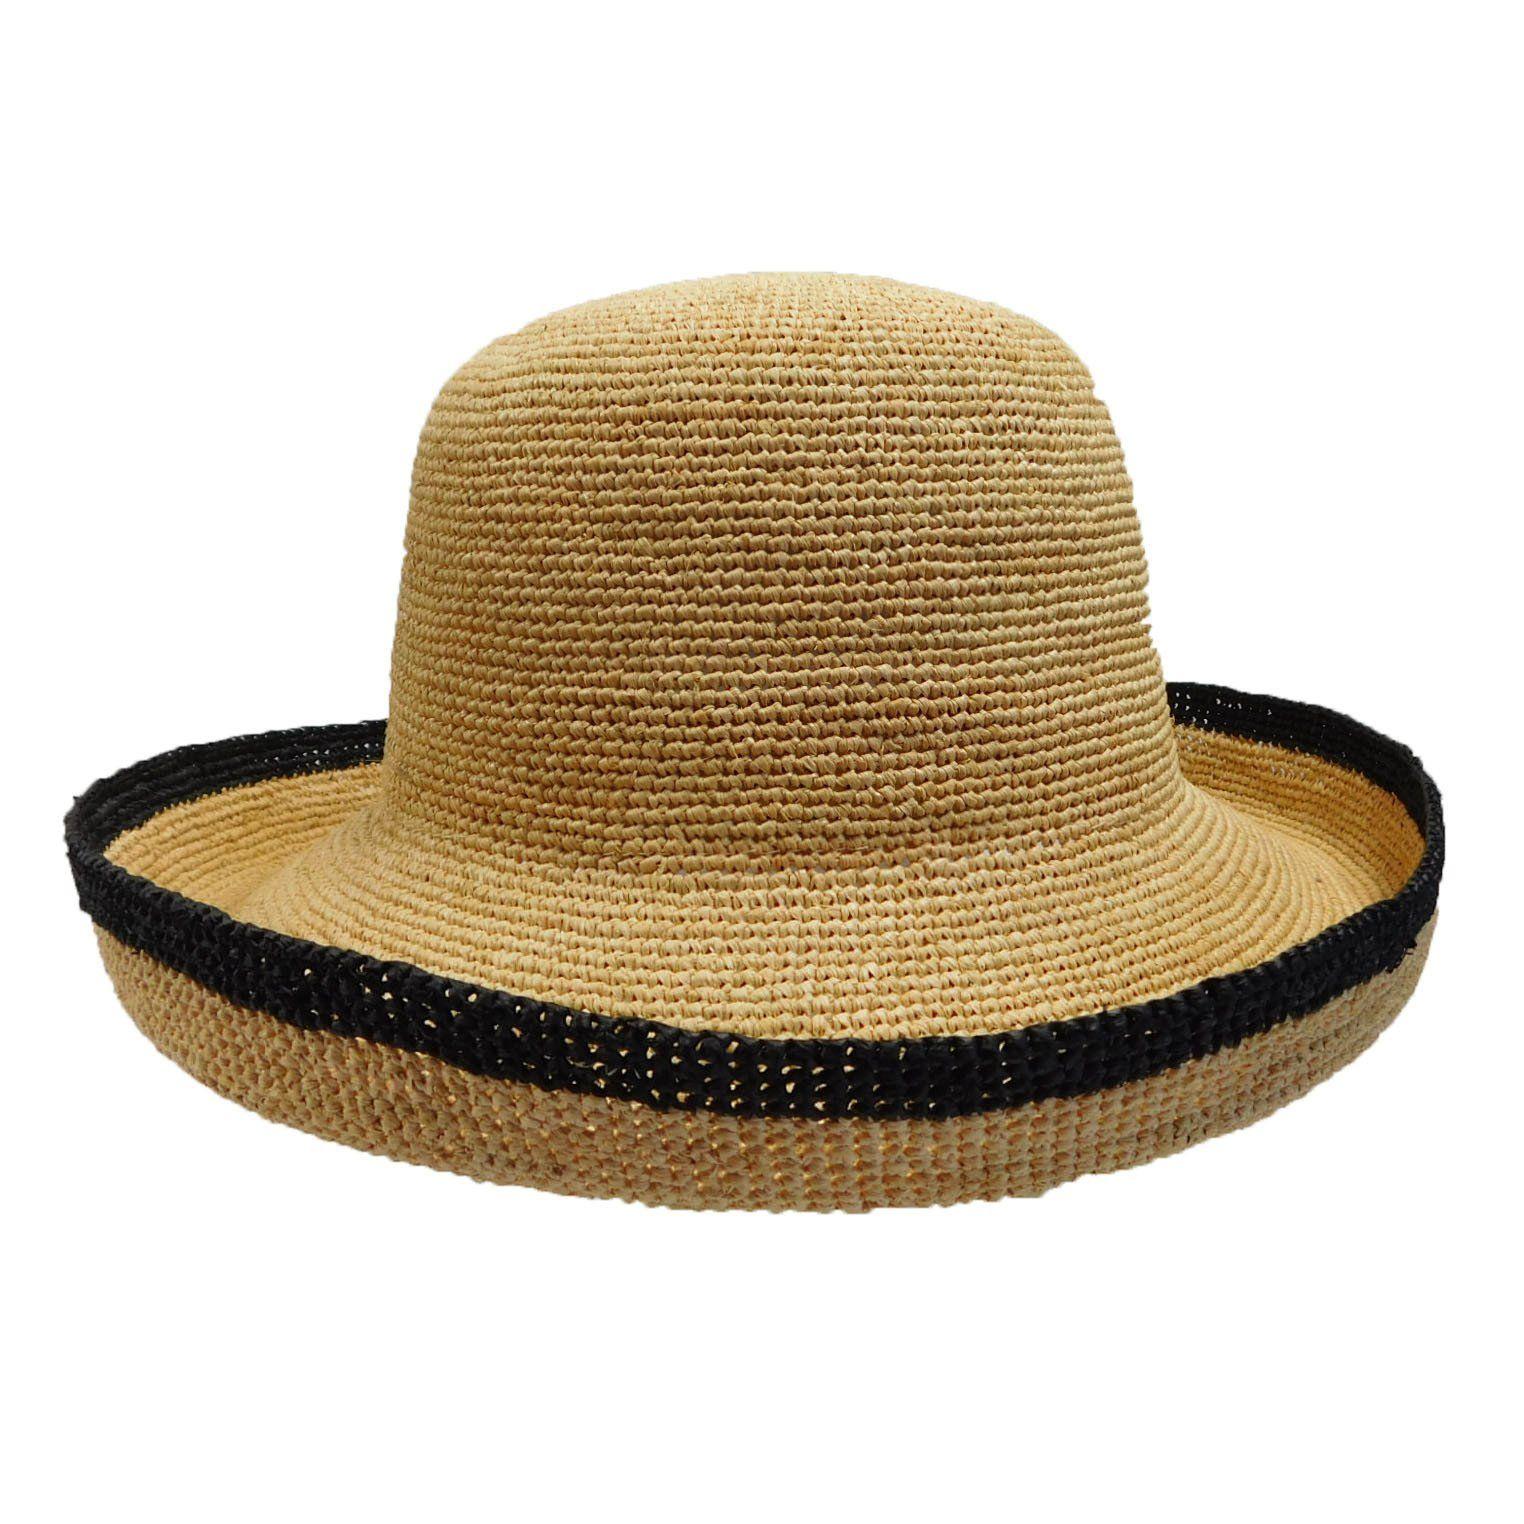 c870e3cdb9e Handmade breton style hat. Up turned brim with black trim. Shapeable, 4